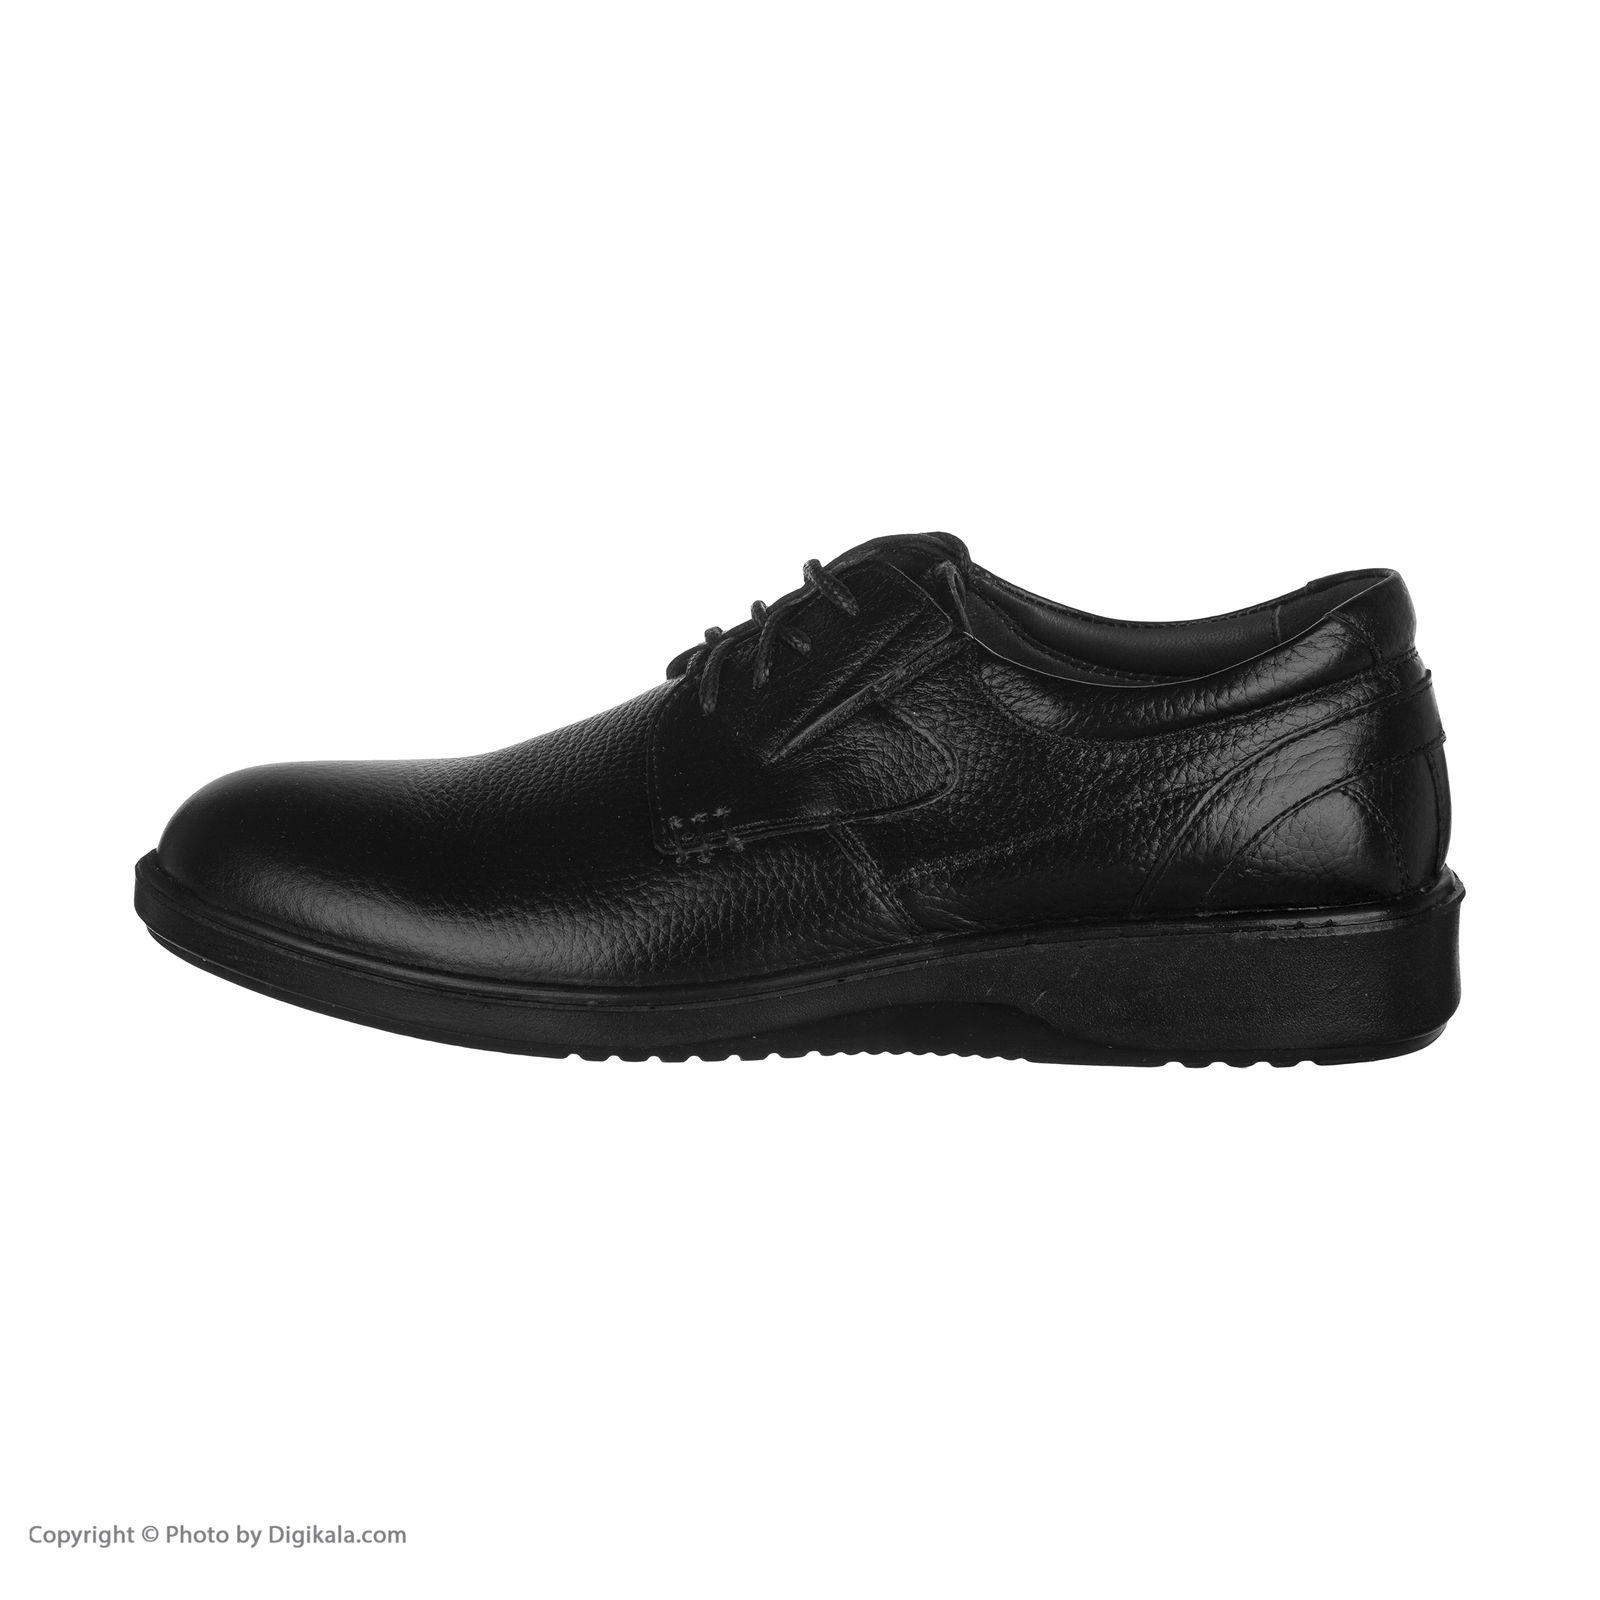 کفش روزمره مردانه آذر پلاس مدل 9438B503101 -  - 3